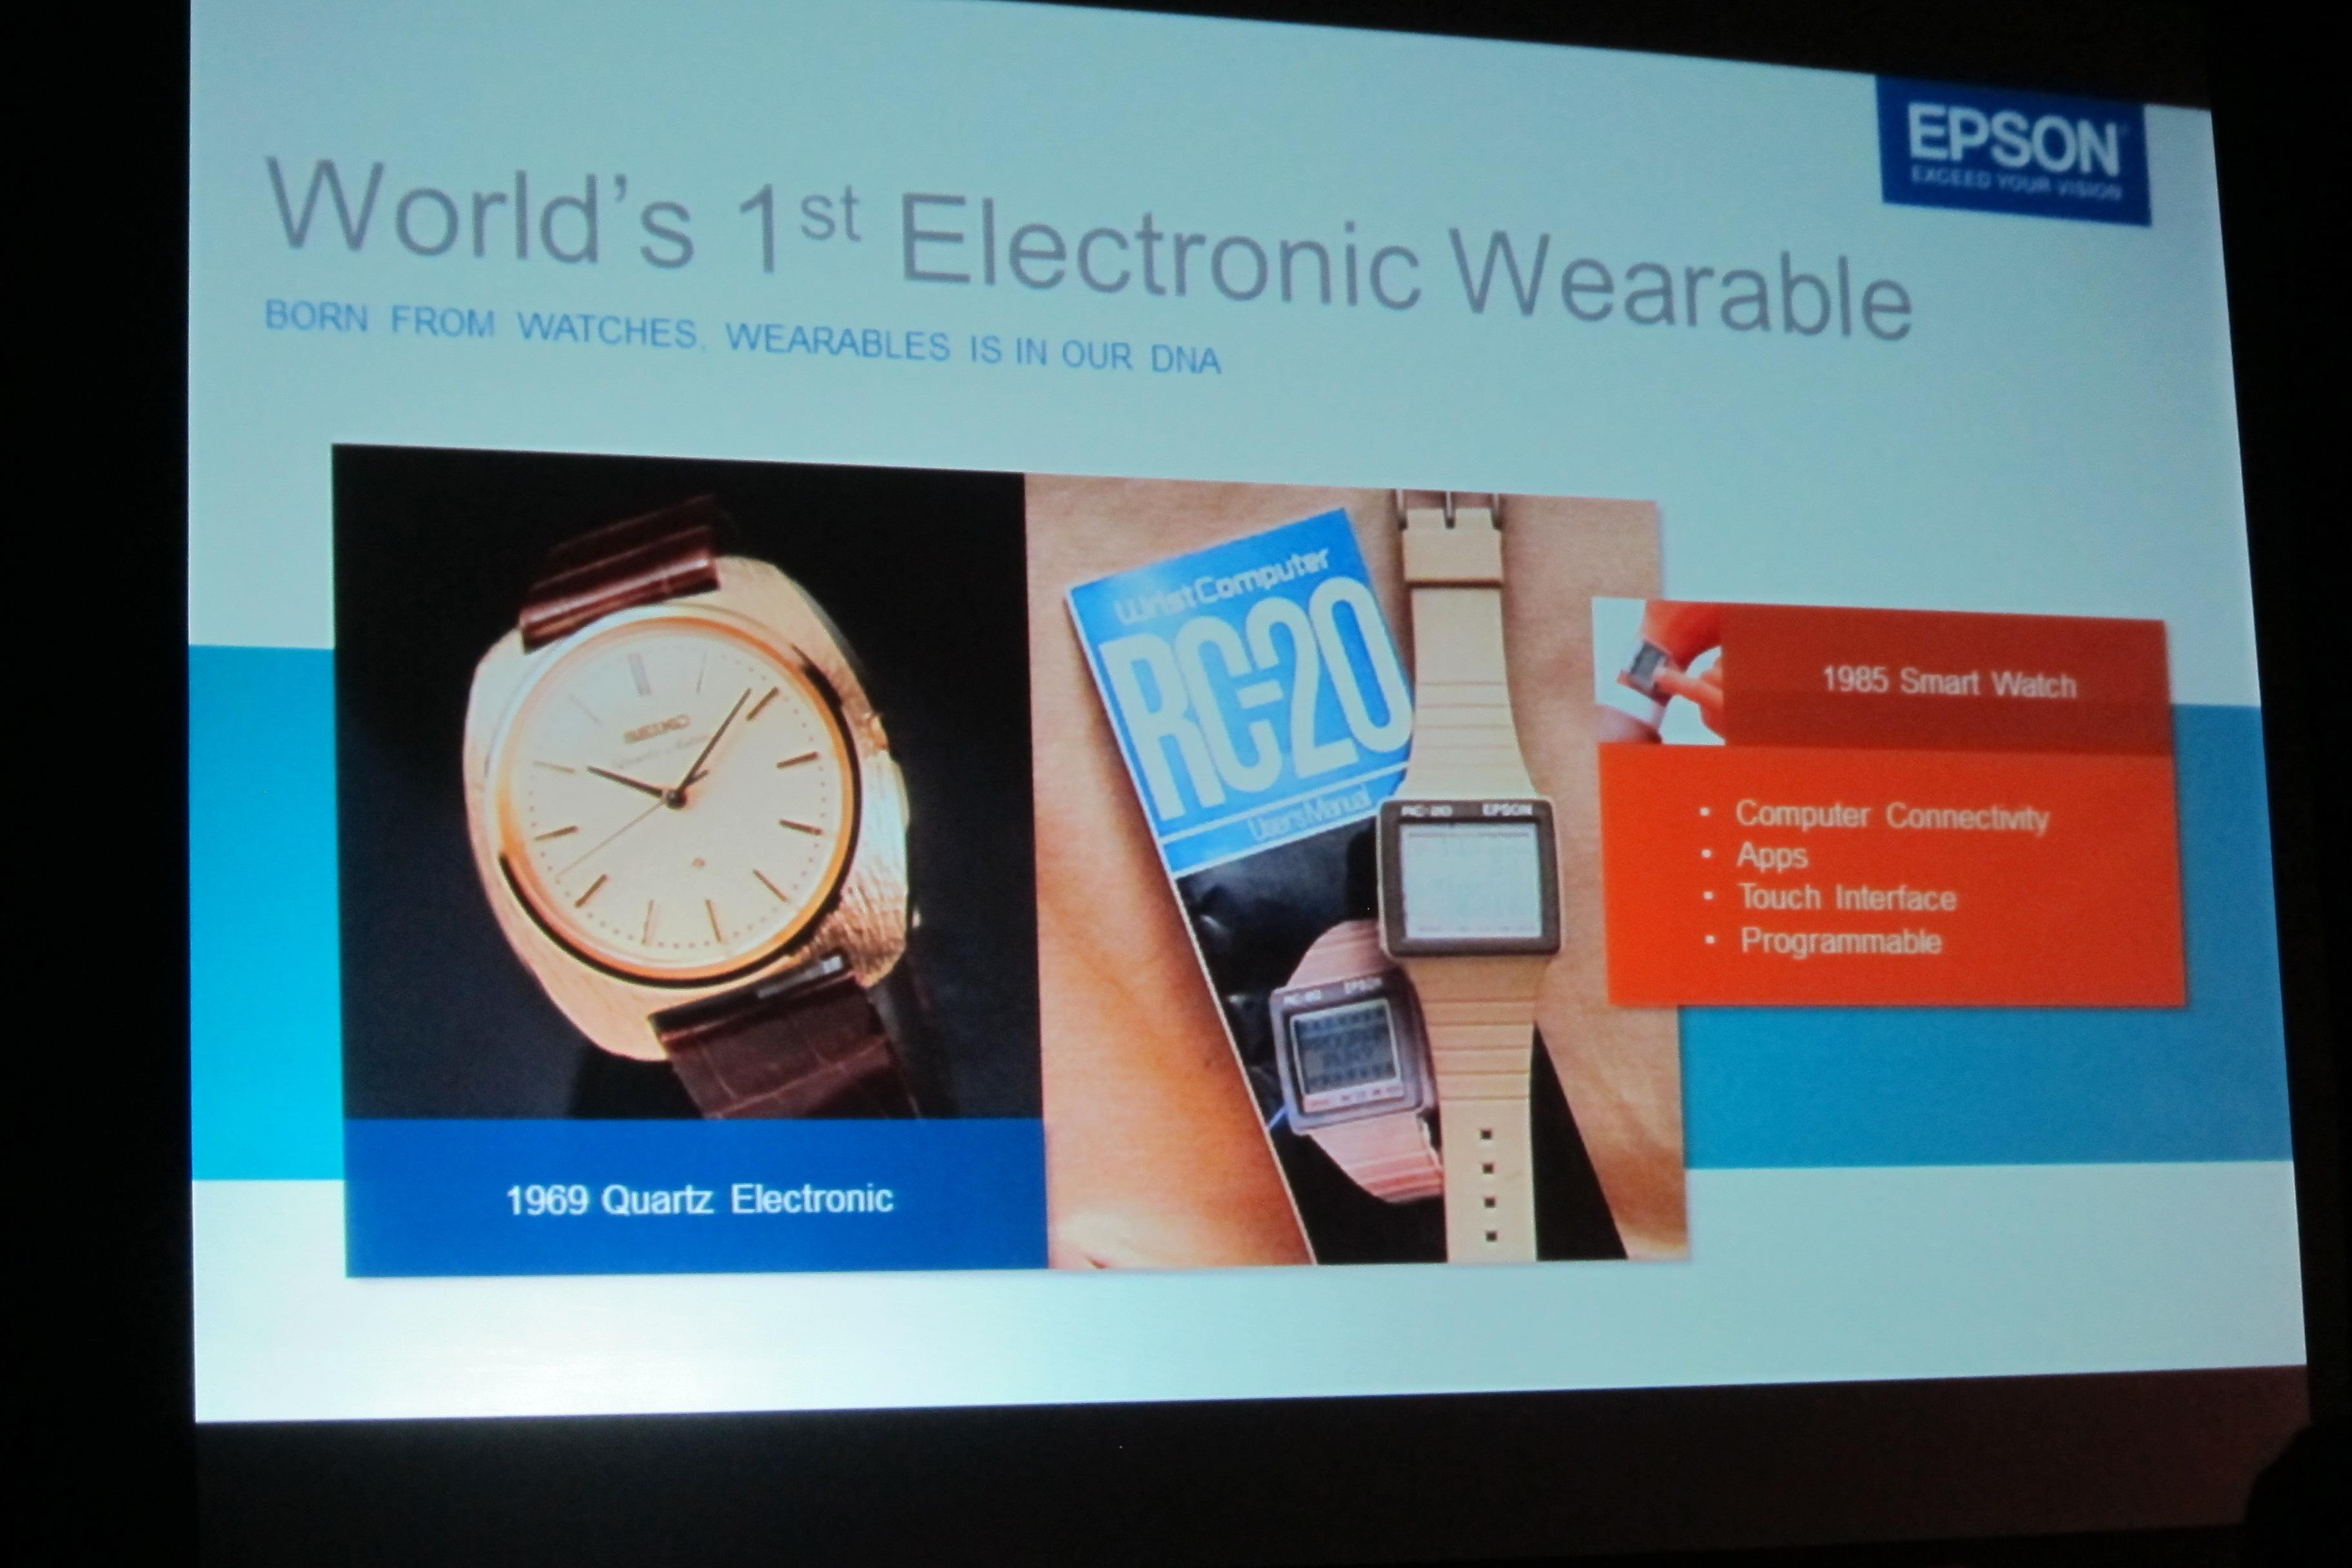 Epson wearable history